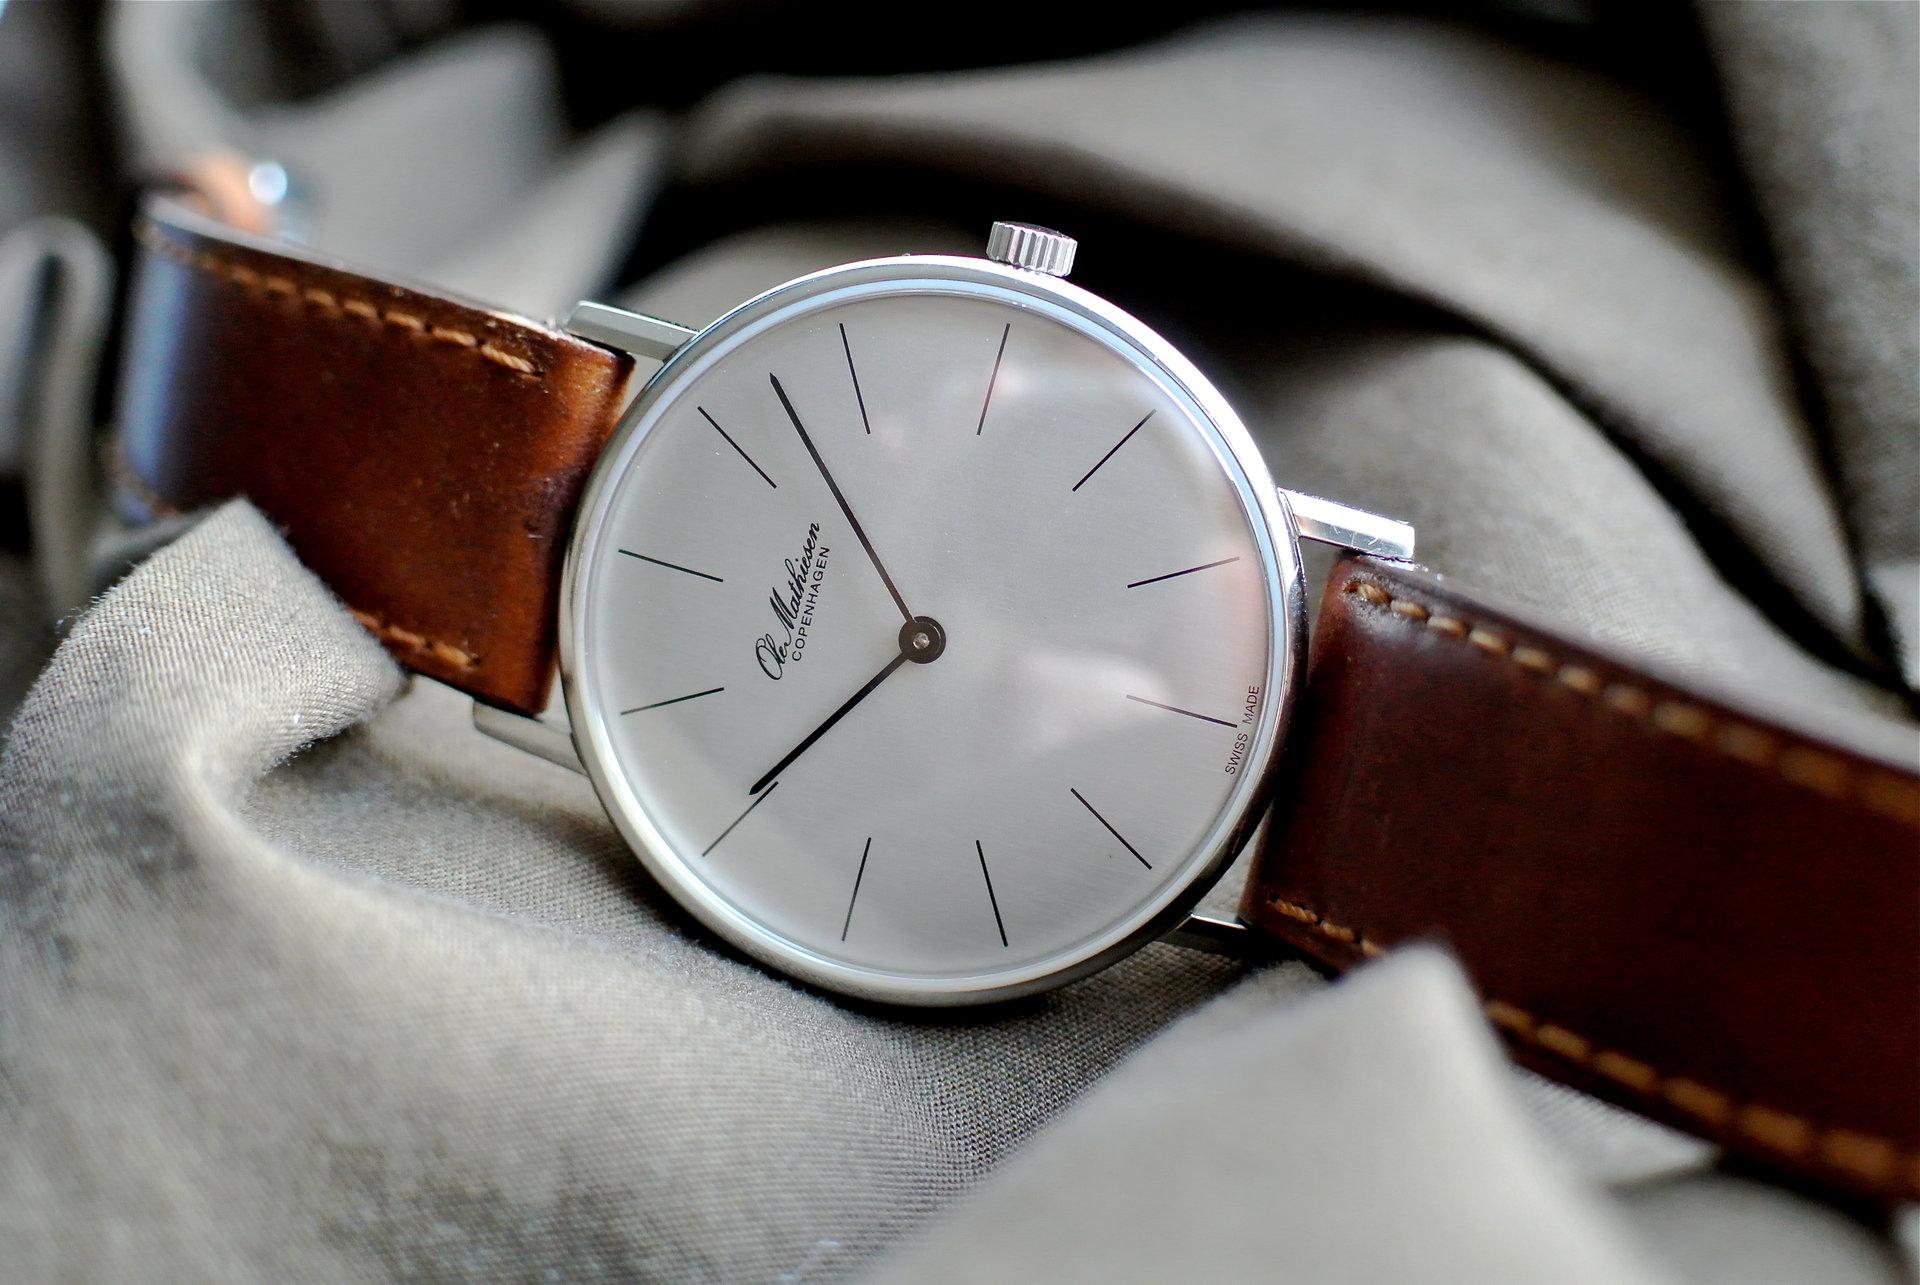 [Erledigt] Ole Mathiesen OM8 -Handaufzug- - UhrForum